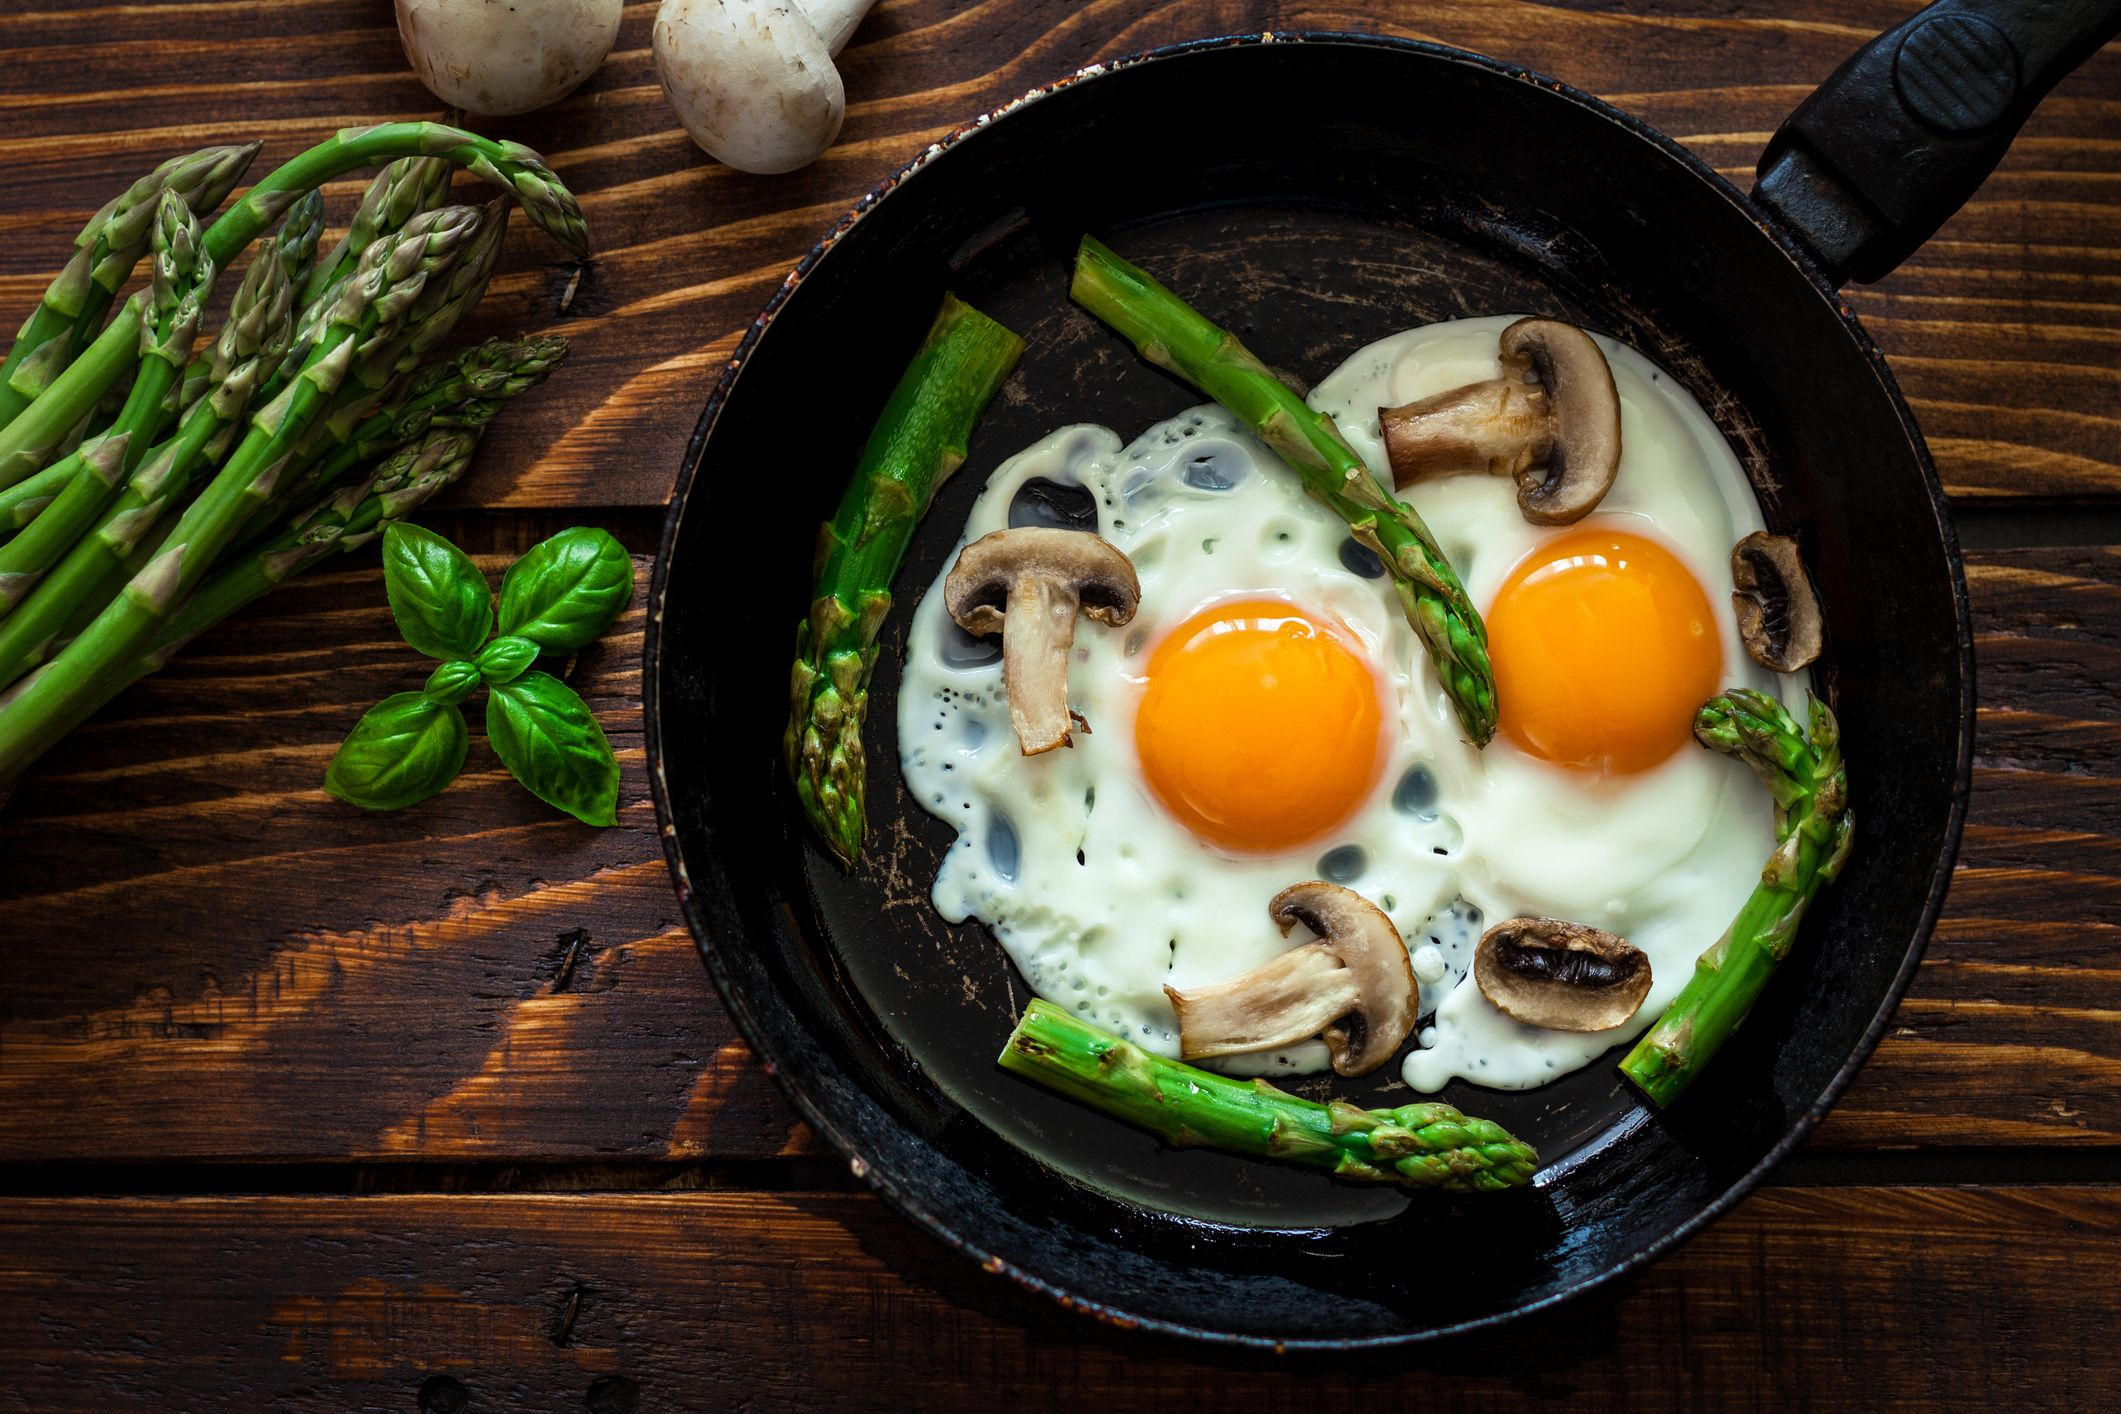 Why vegans and vegetarians need vitamin B12